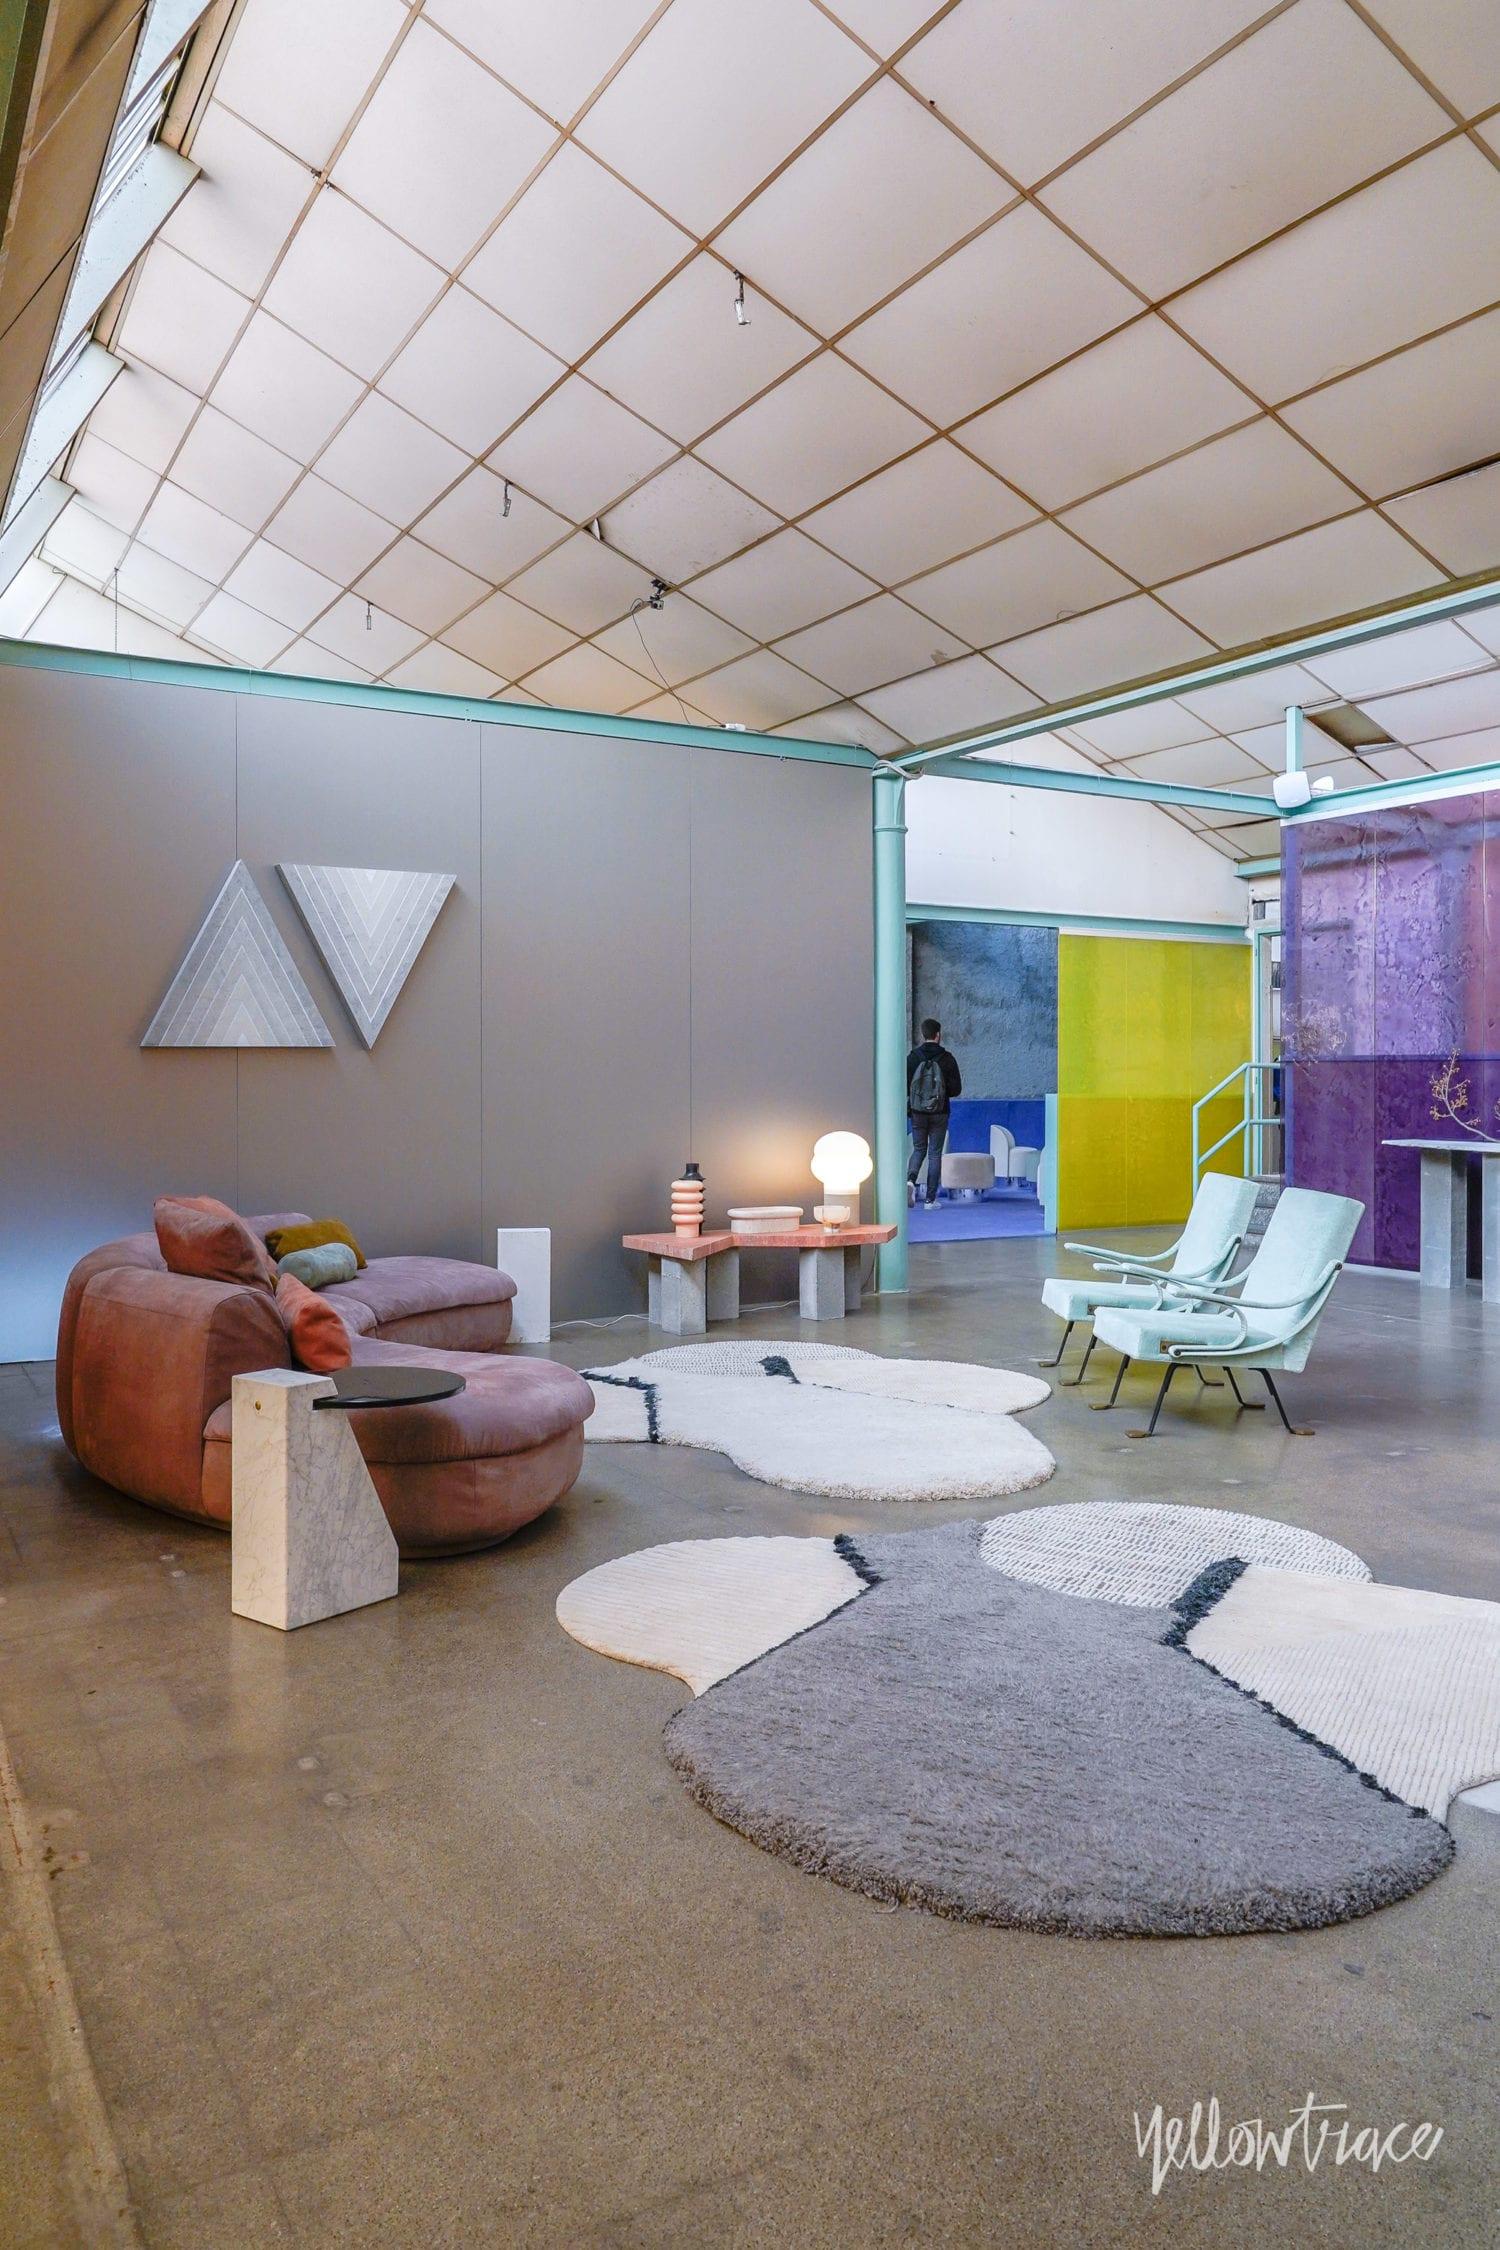 Les Arcanistes Studiopepe At Milan Design Week 2019 Photo Nick Hughes Yellowtrace 16